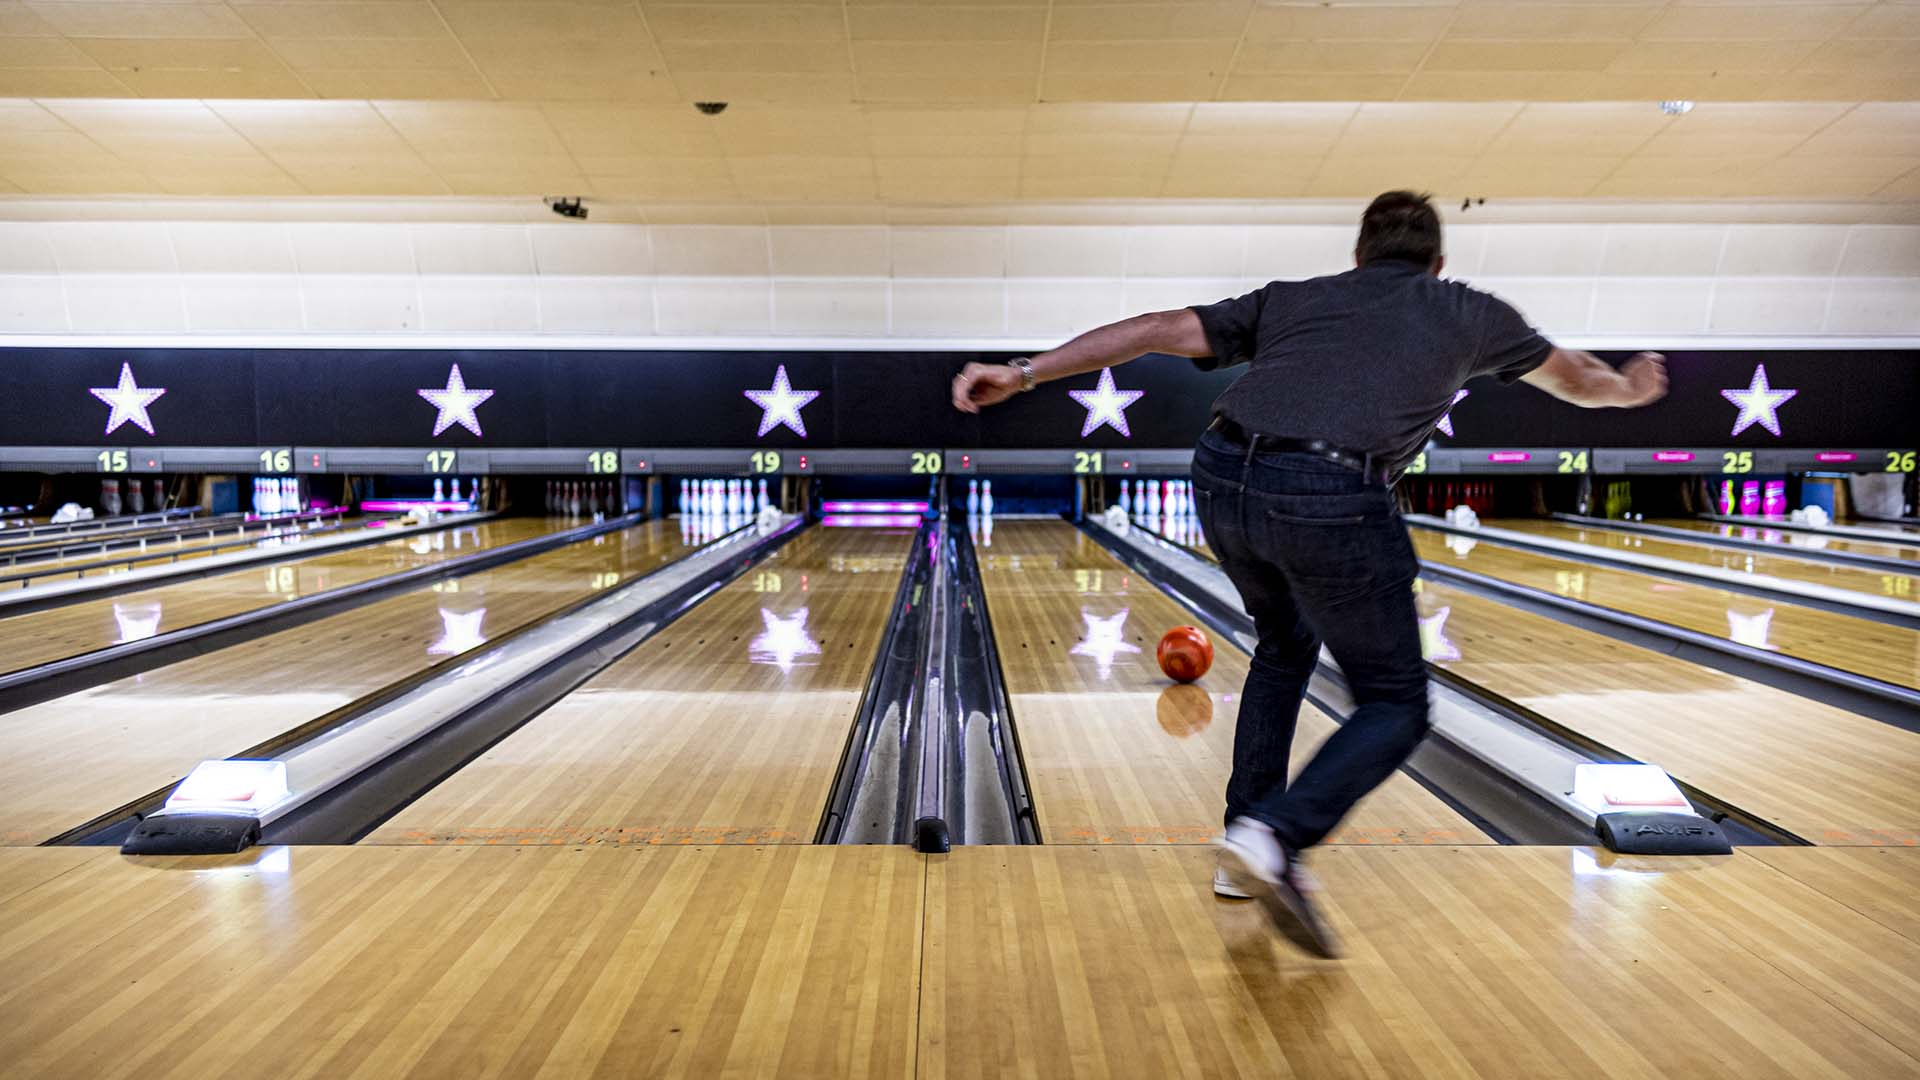 Ten Pin Bowling health and safety bowling crawley hollywood bowl 165104 (1) new